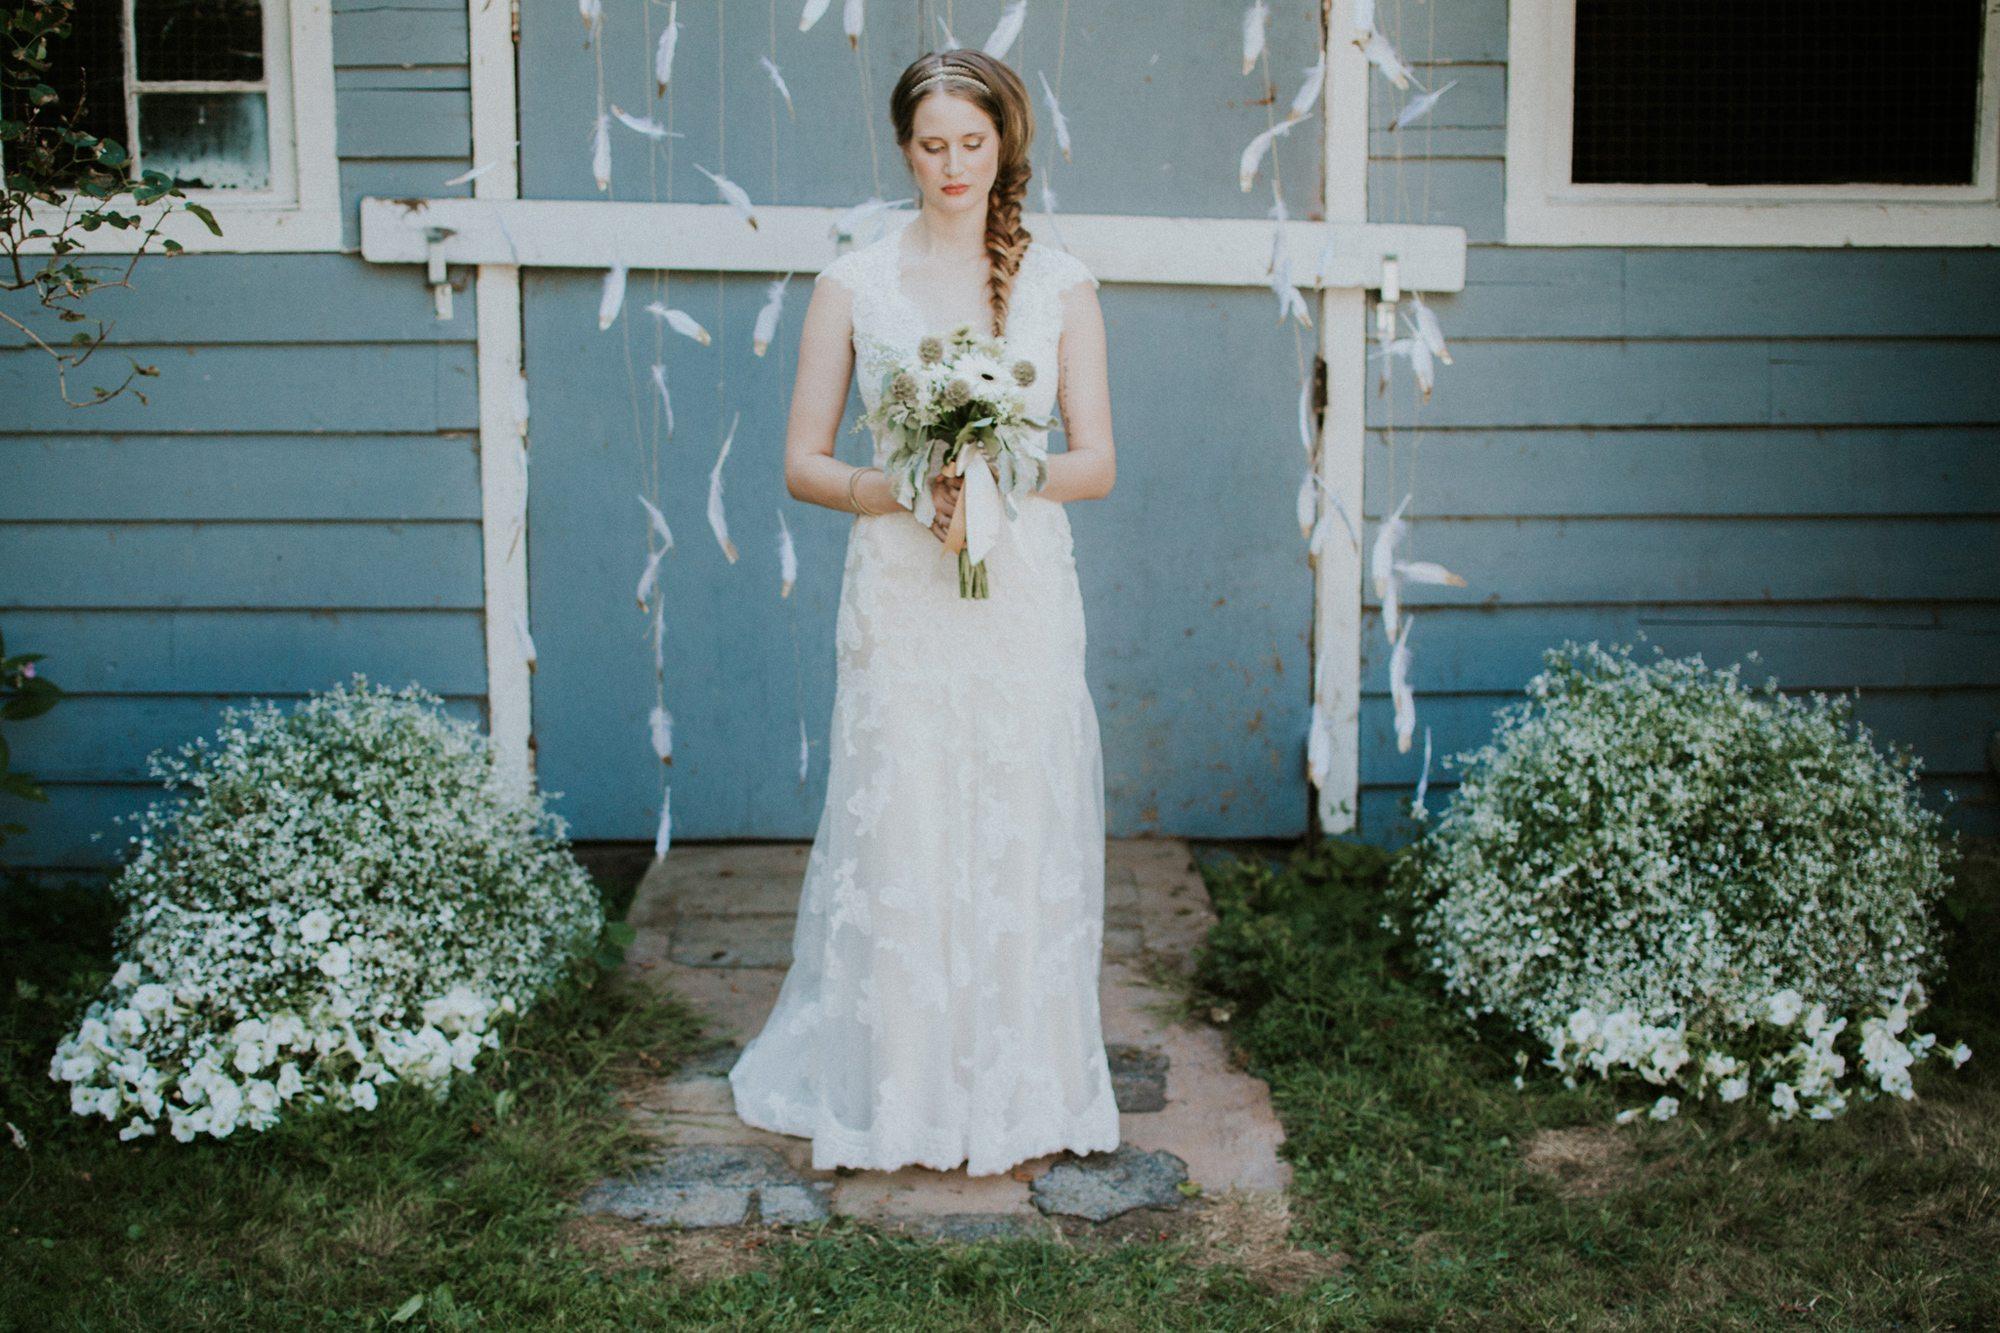 837-abbotsford-wedding-photographer